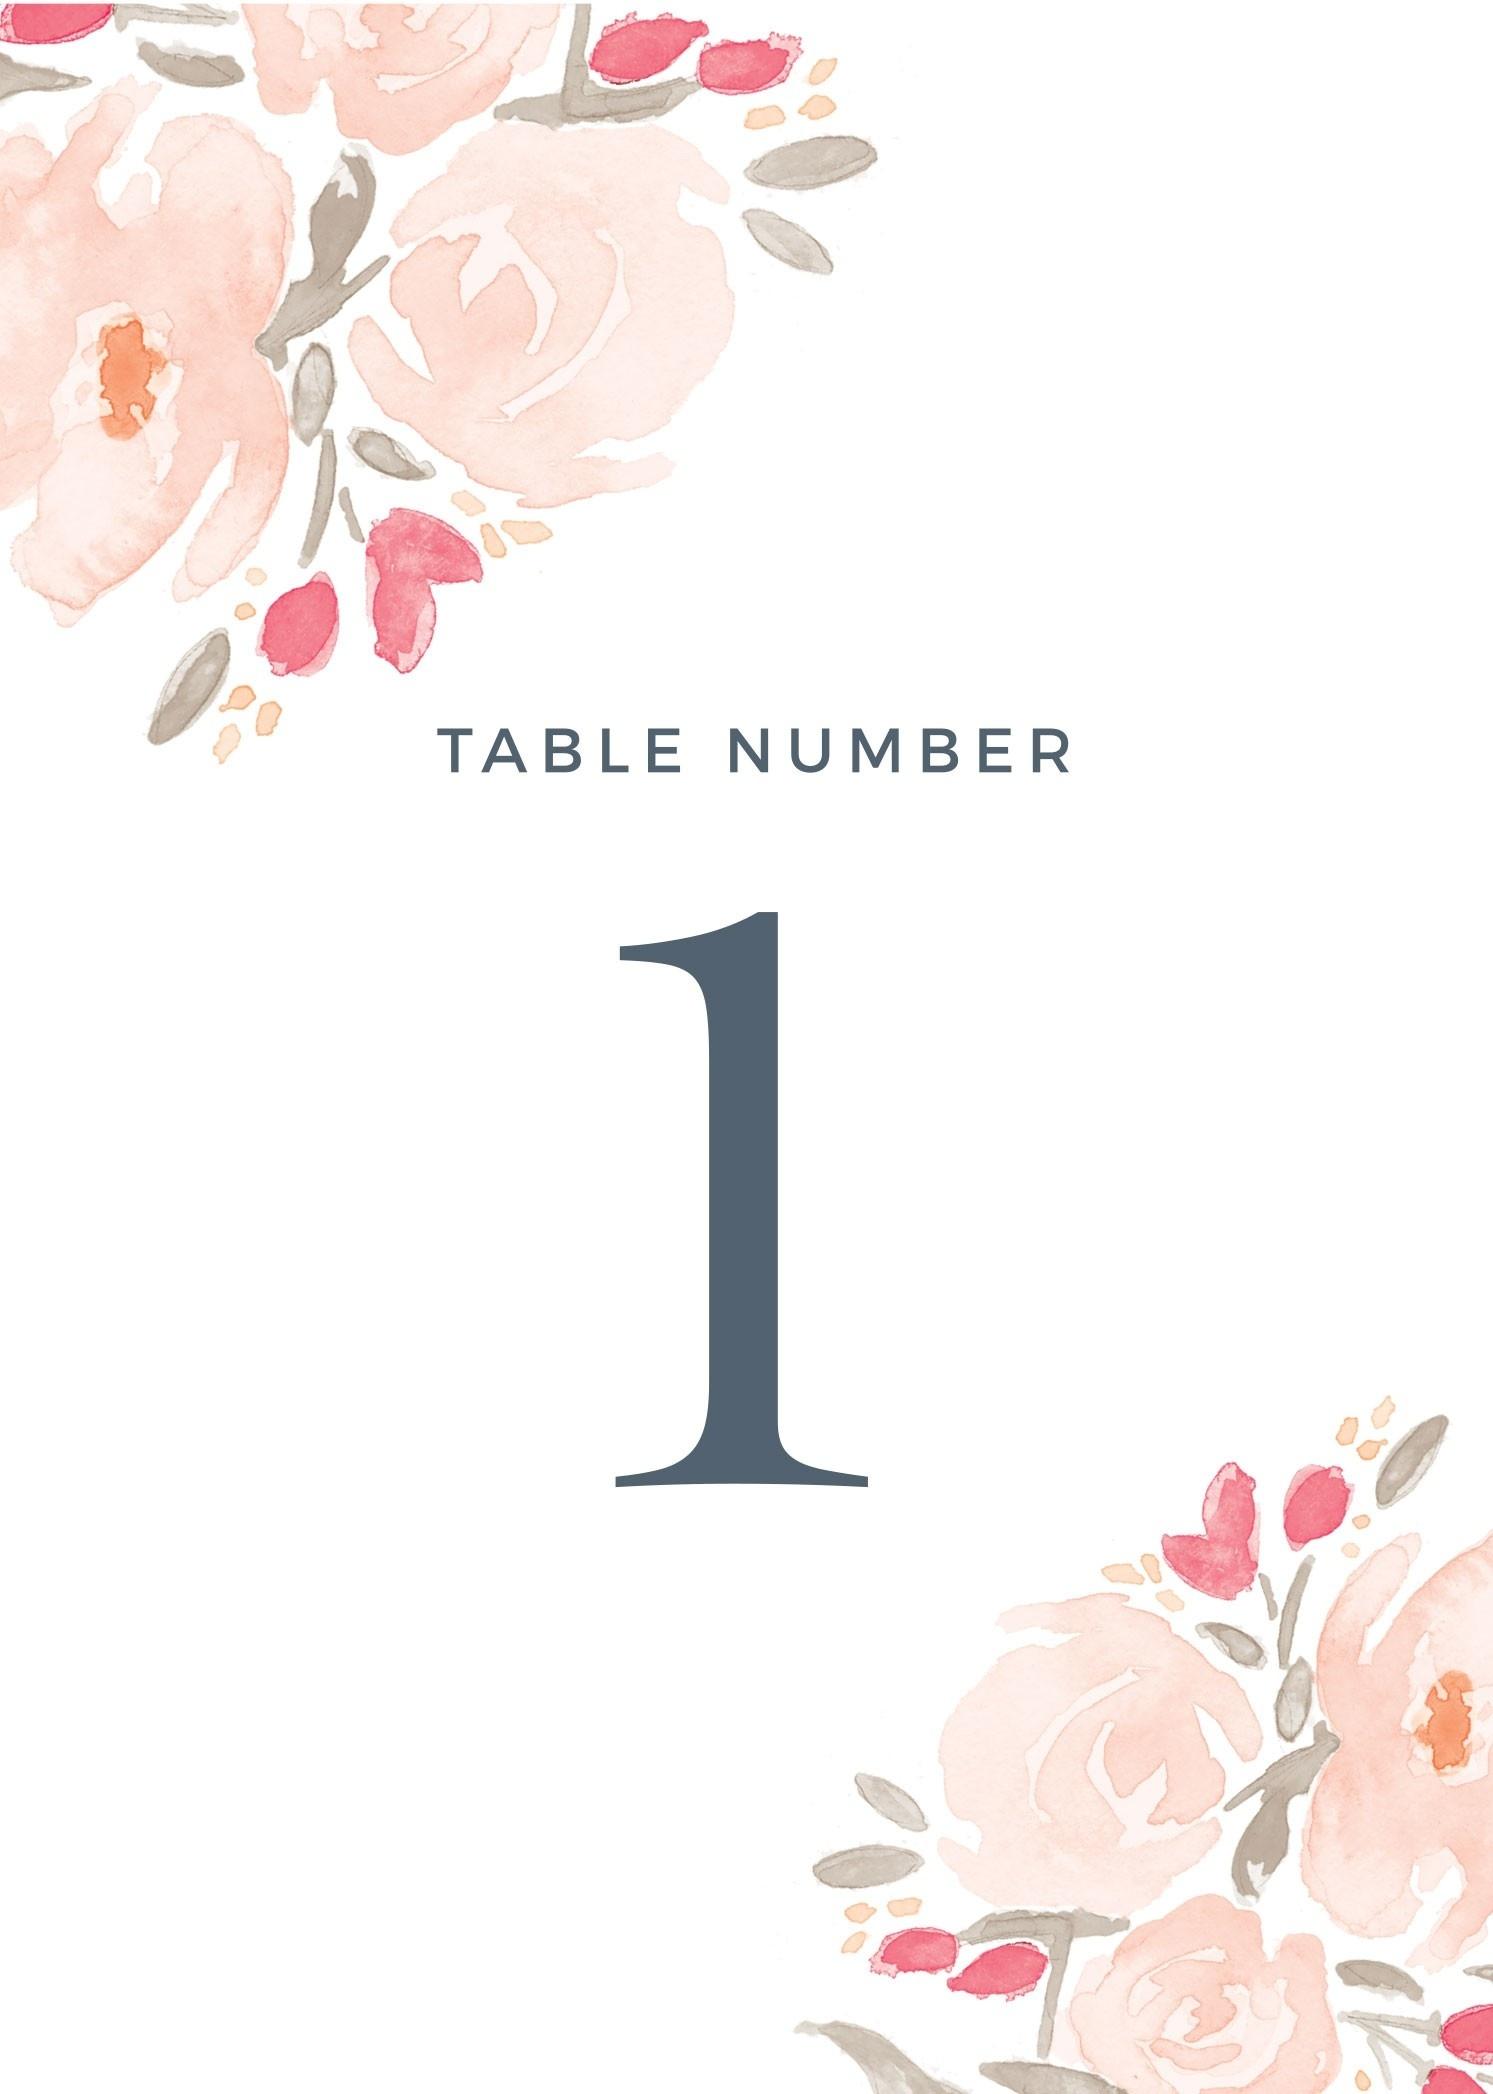 Wedding Table Numbers | Printable Pdfbasic Invite - Free Printable Table Numbers 1 30